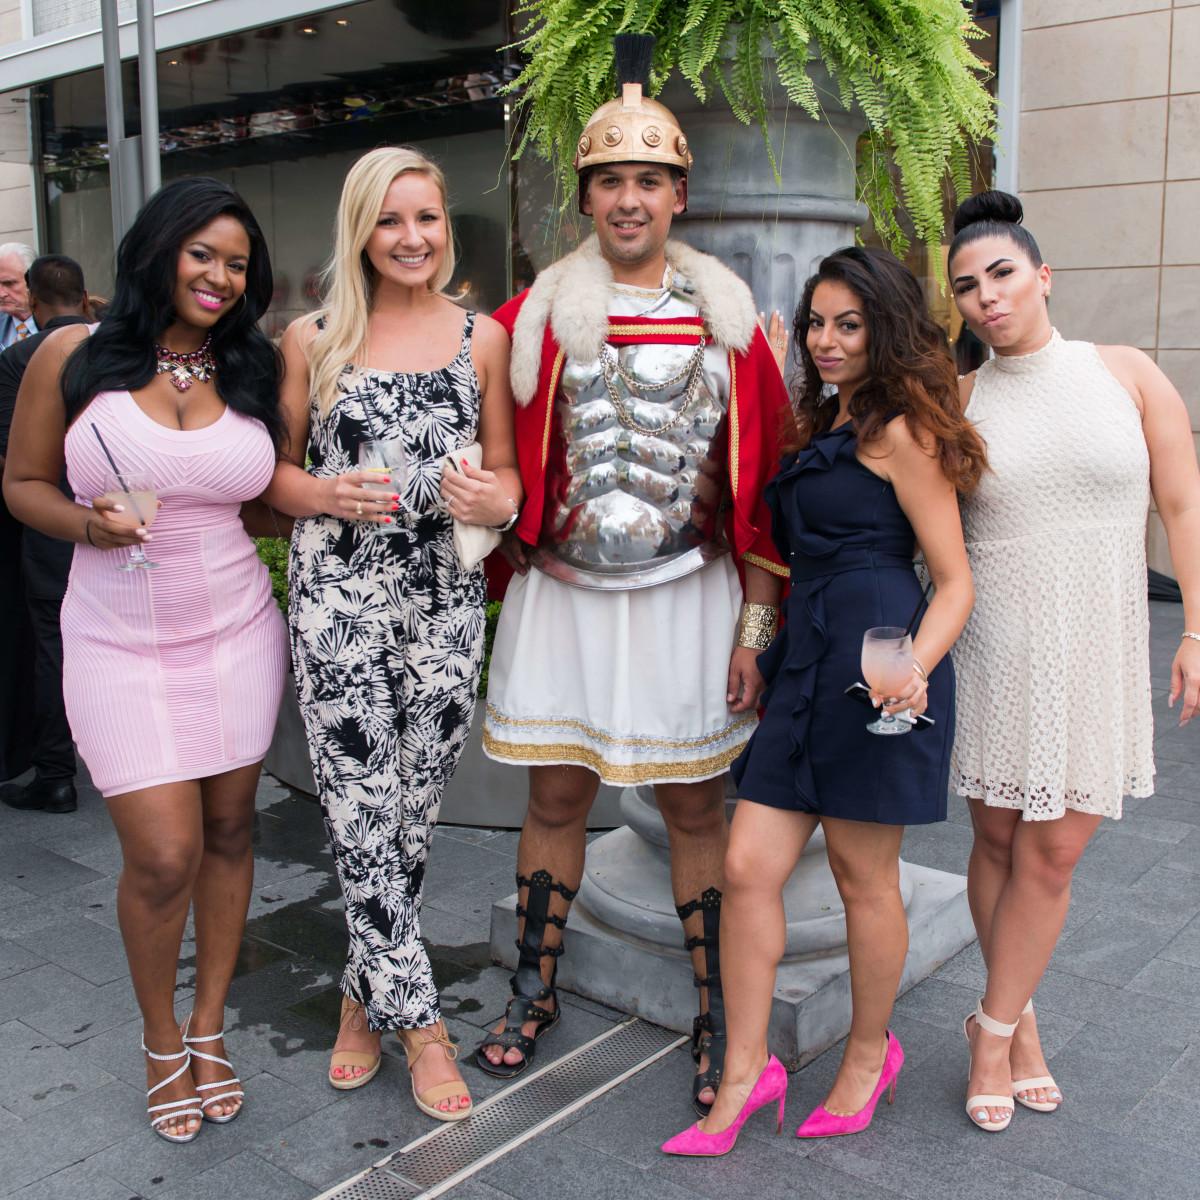 Ben-Hur premiere, Aug. 2016, Atia Willis, Kyle Hassenmiller, Christopher Marquez, Katie Naciri, Ashley Zeigler